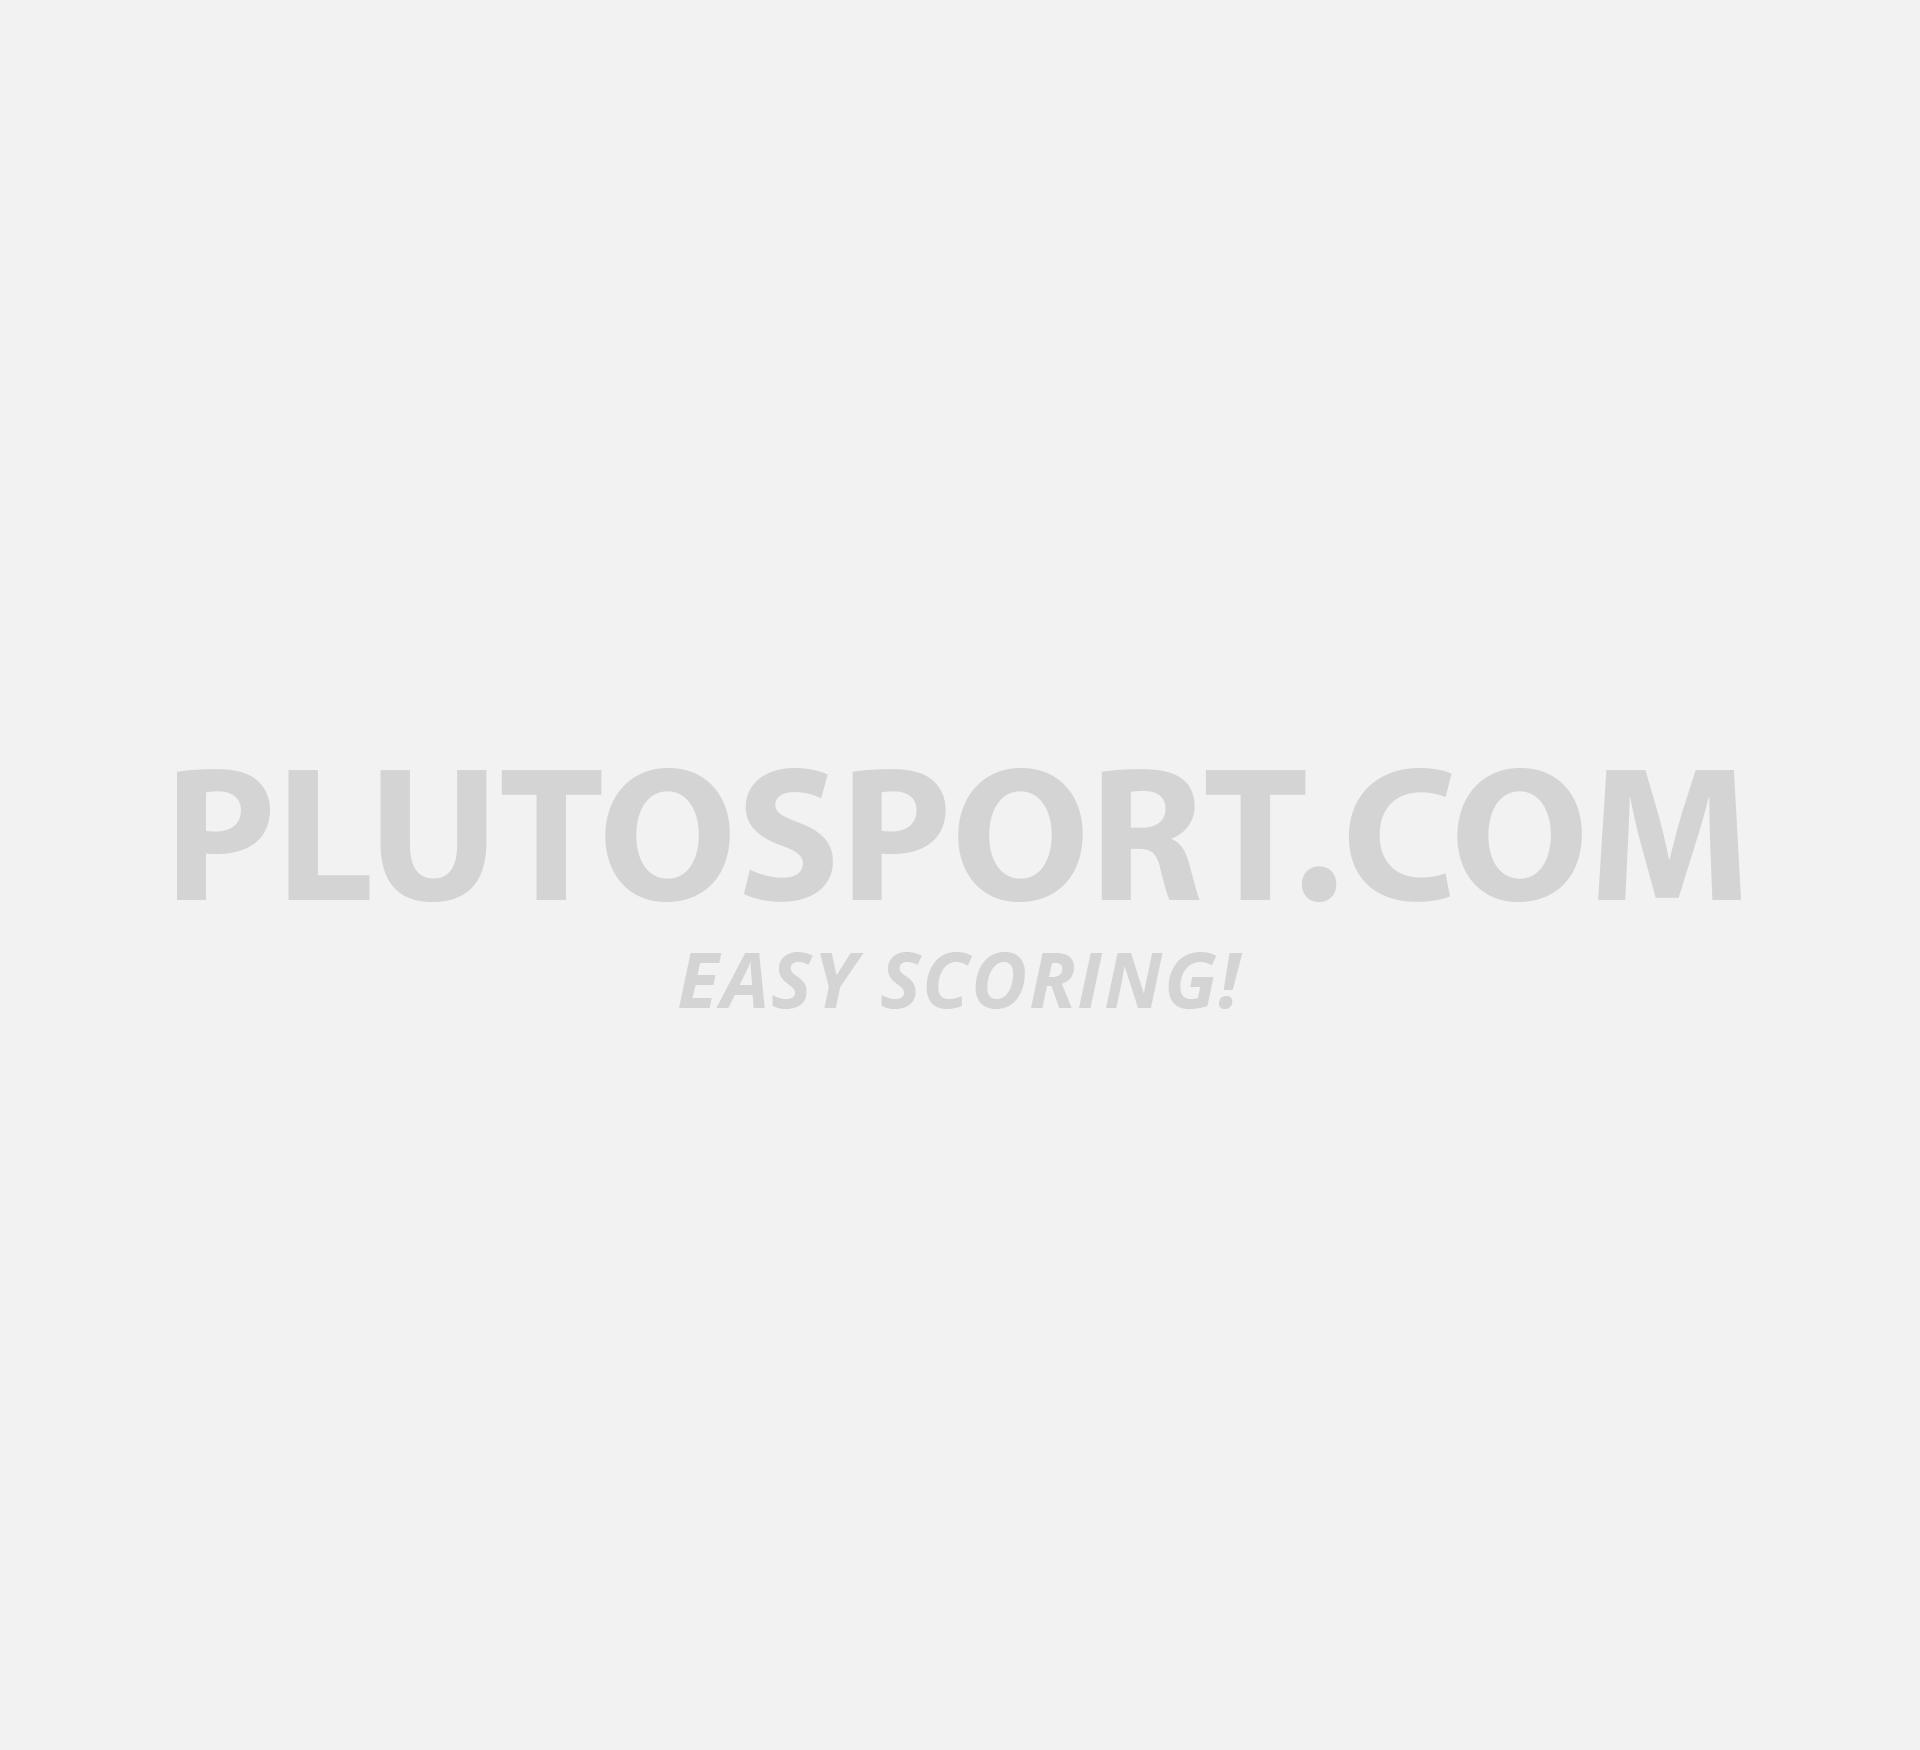 Adidas adiPower Barricade 8+ Tennis Shoes Men - Gravel - Shoes - Tennis -  Sports  b858d4c31d26